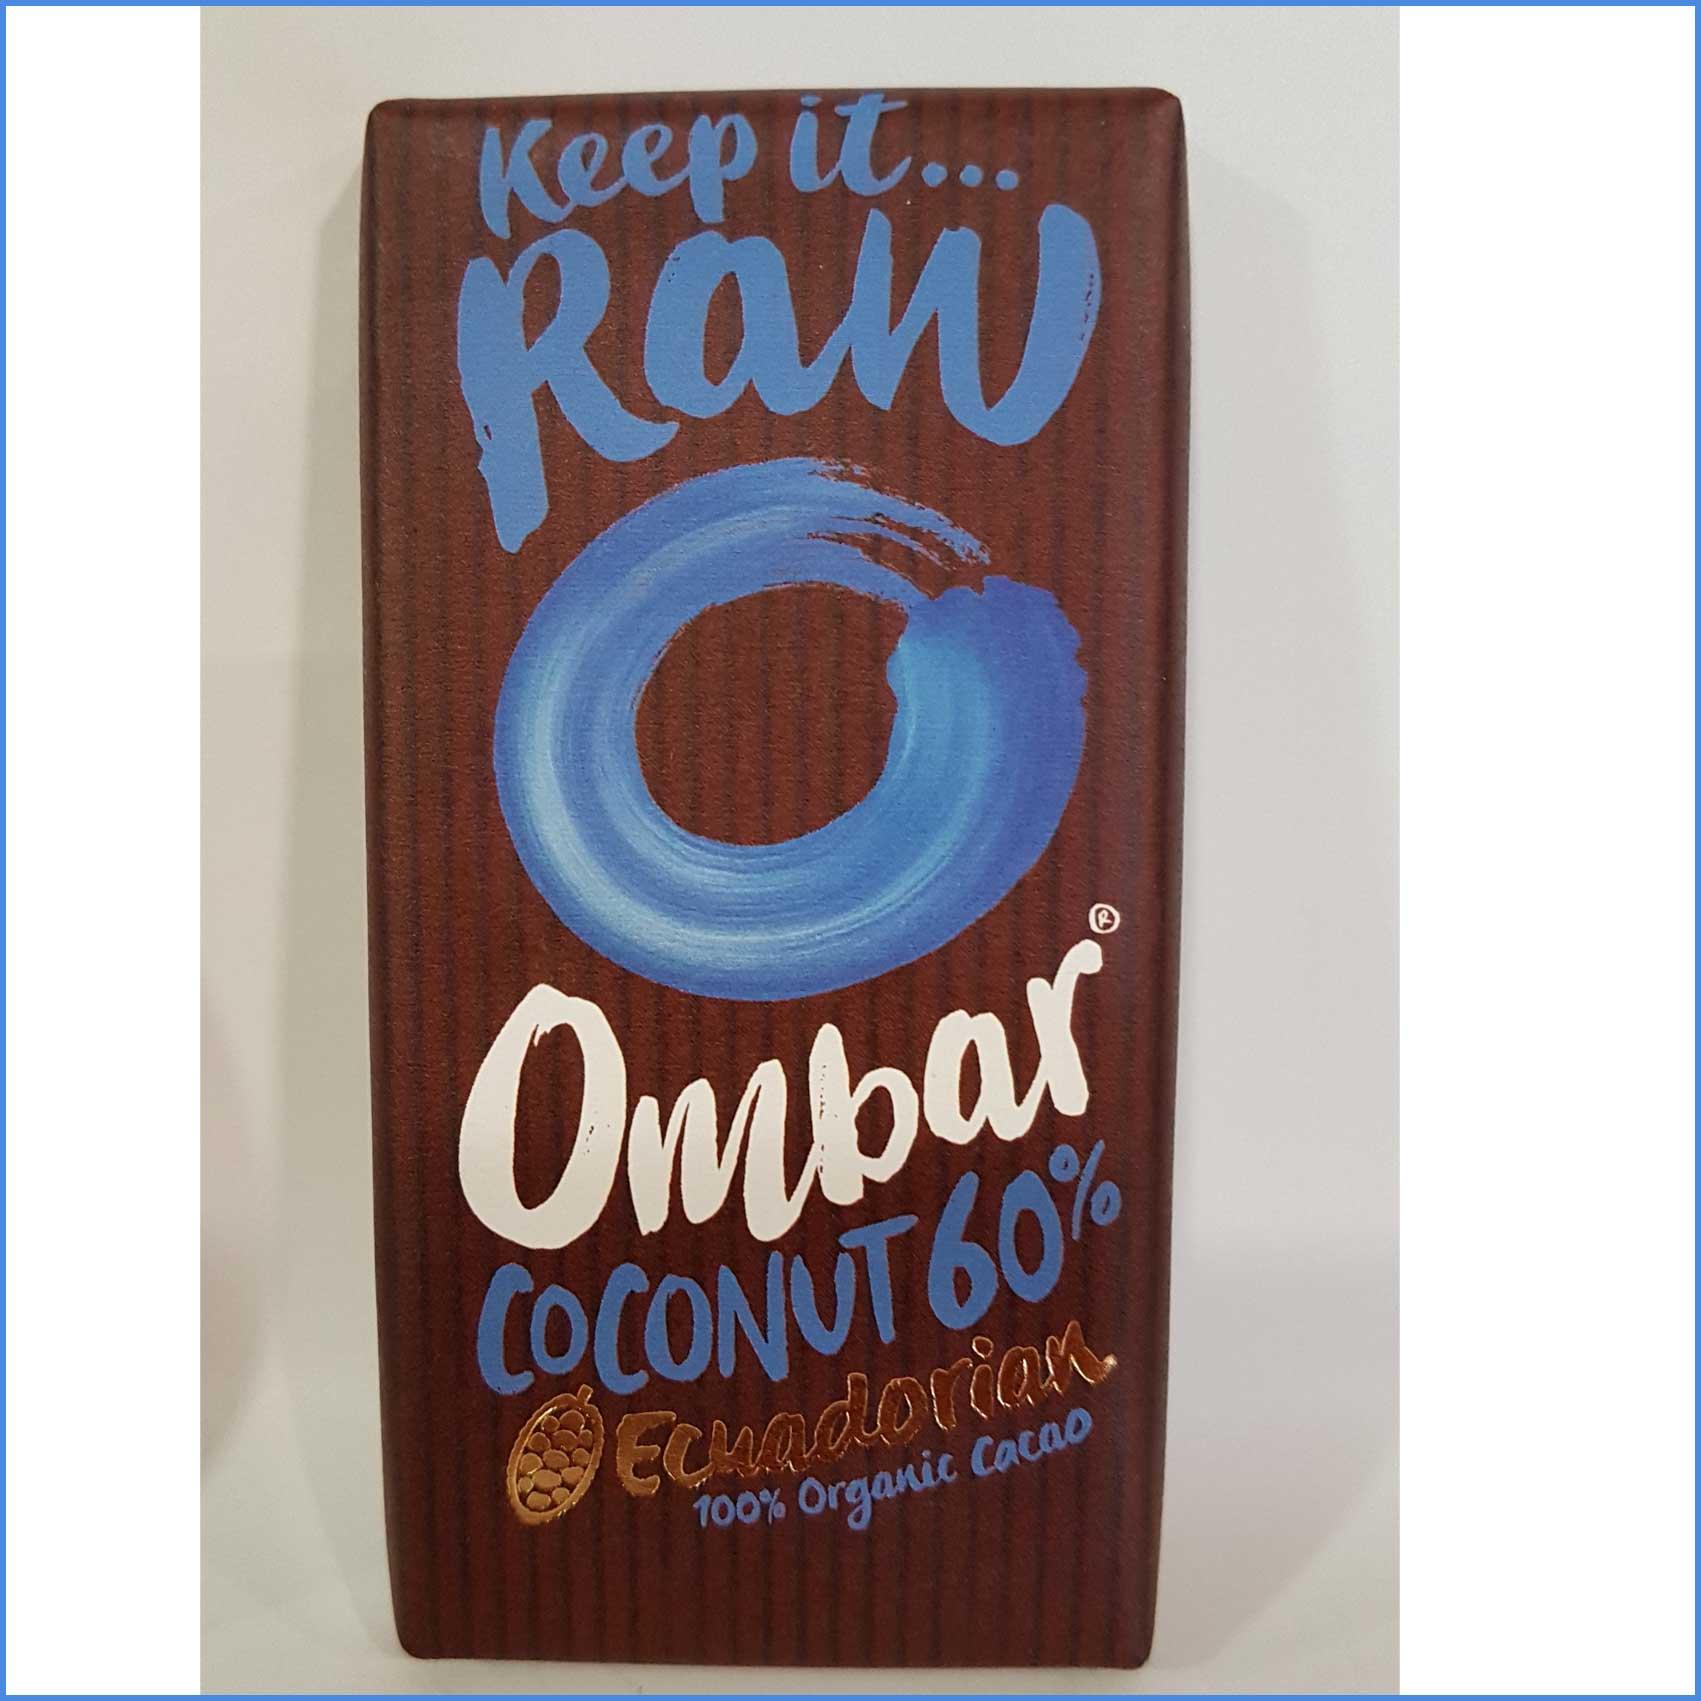 OMBAR Coconut 60% RAW organic Chocolate